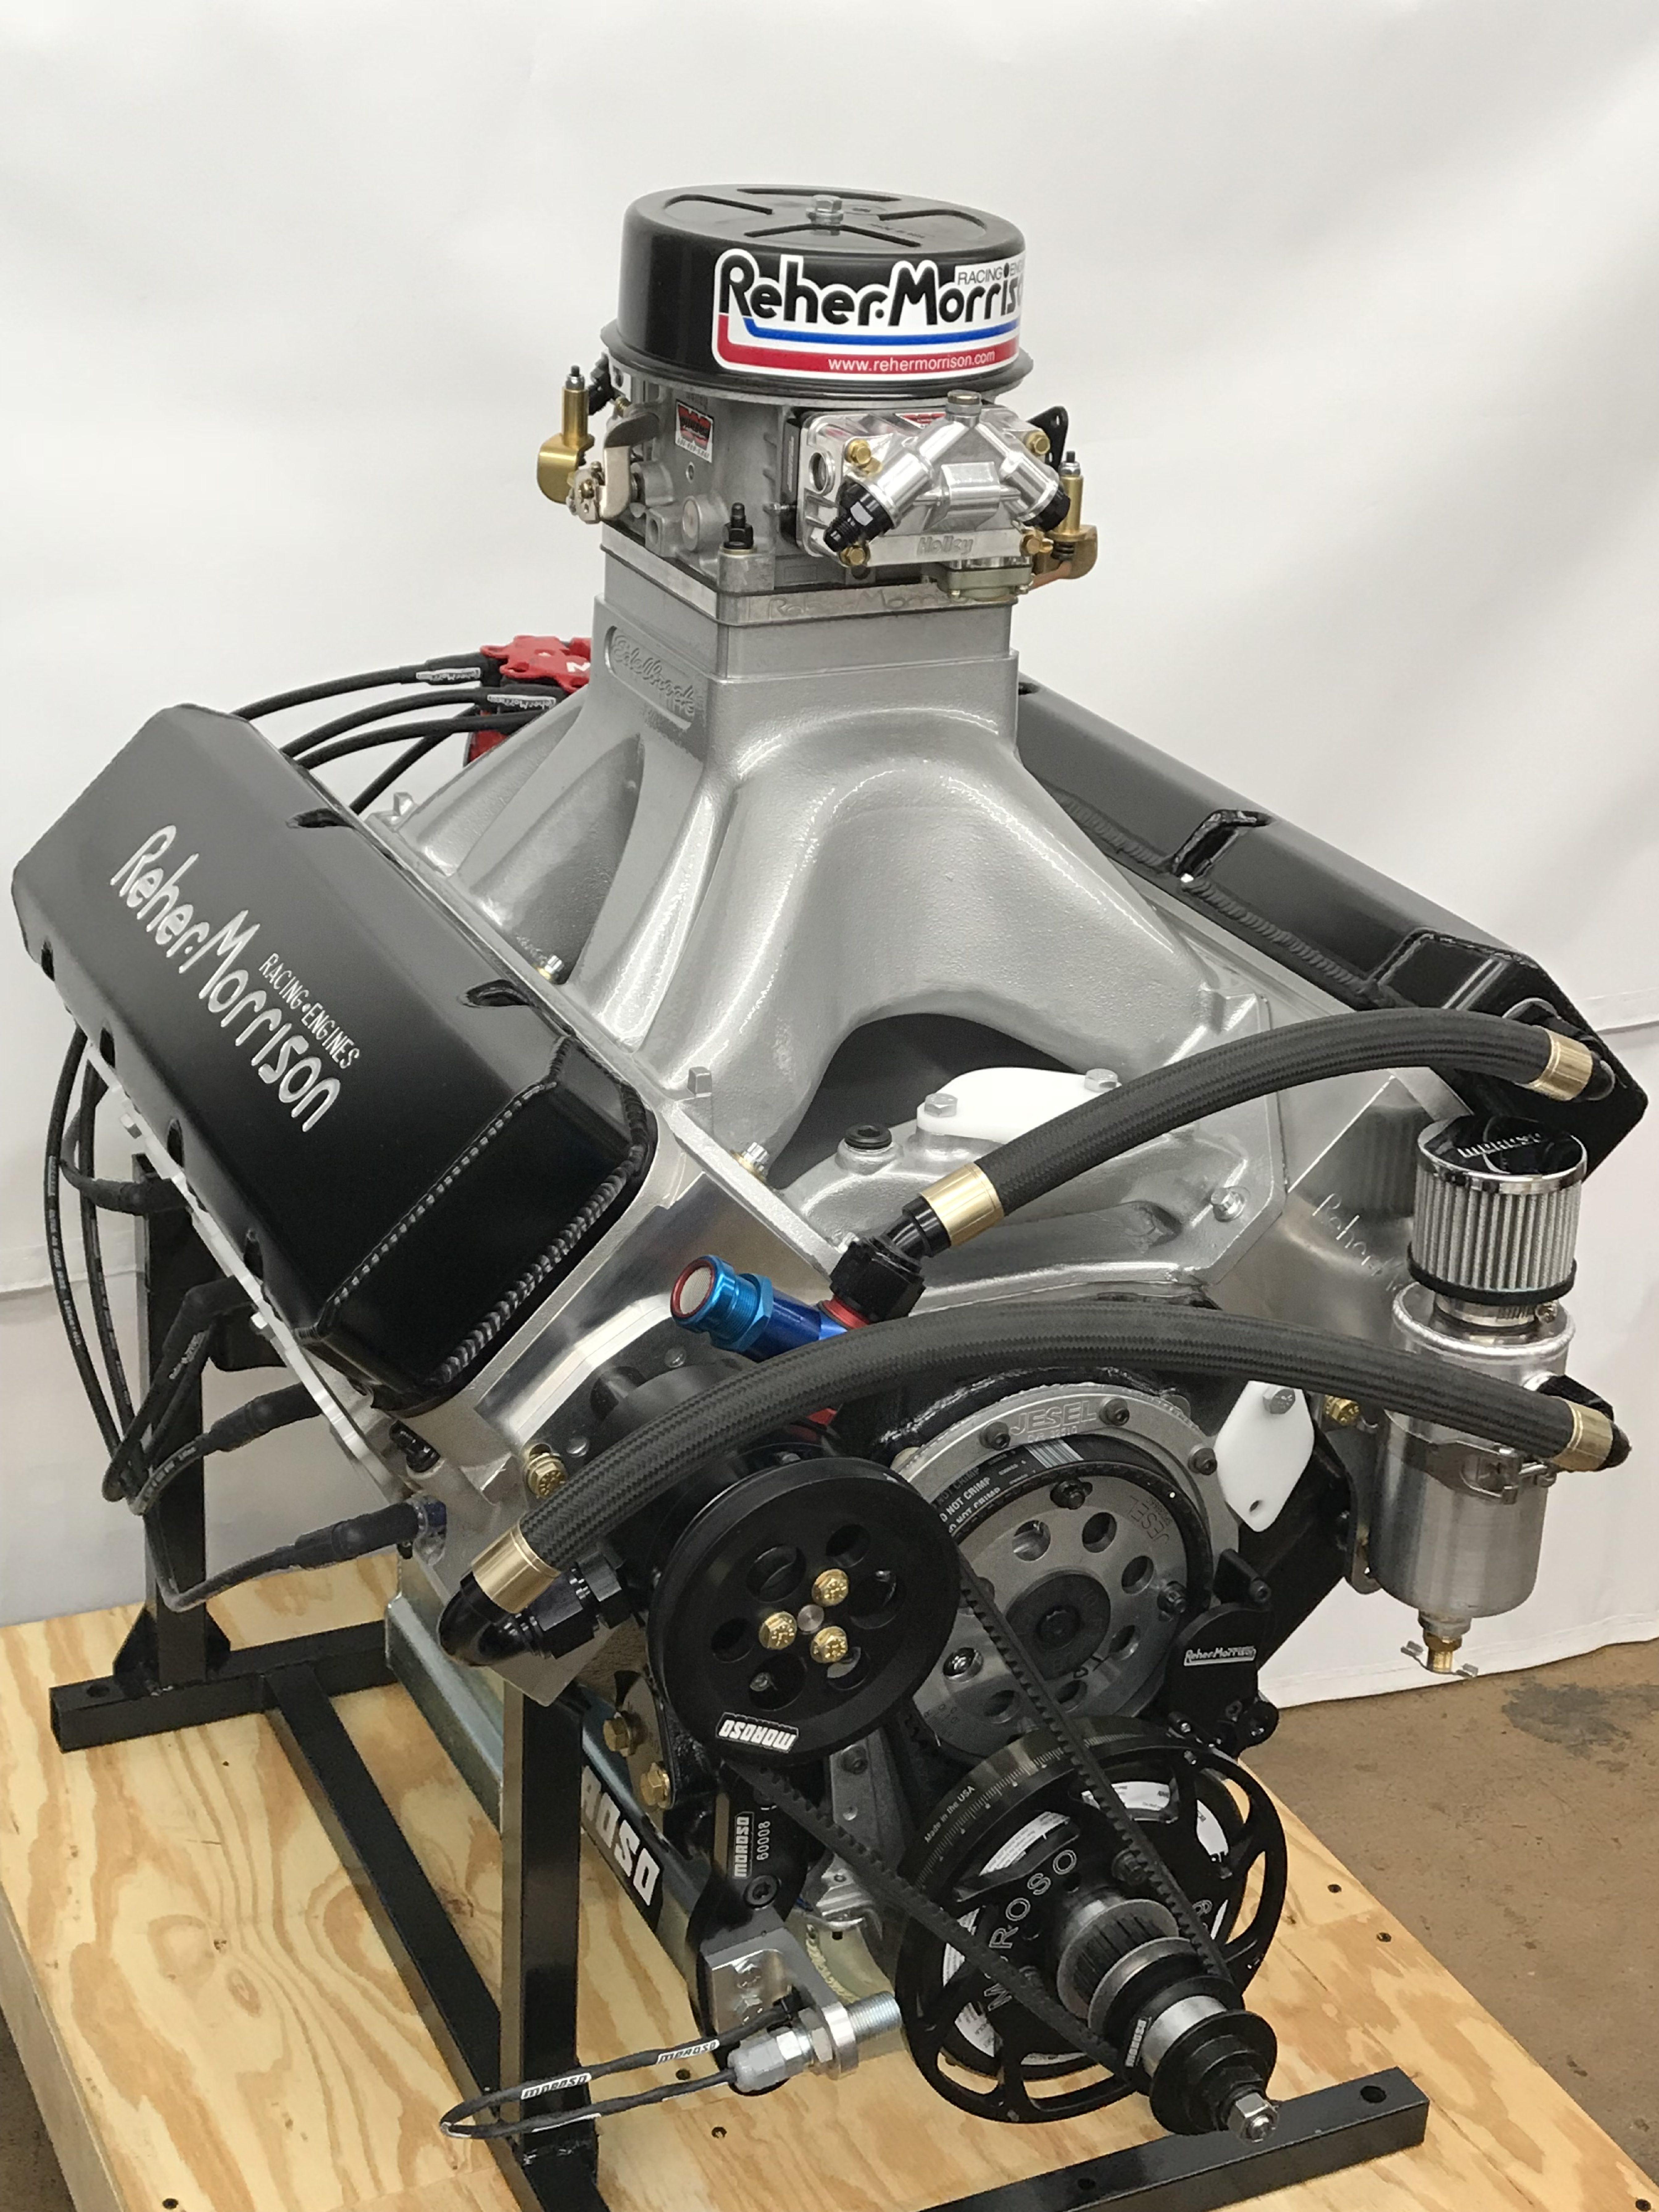 583ci Super Series-12º | Reher Morrison Racing Engines